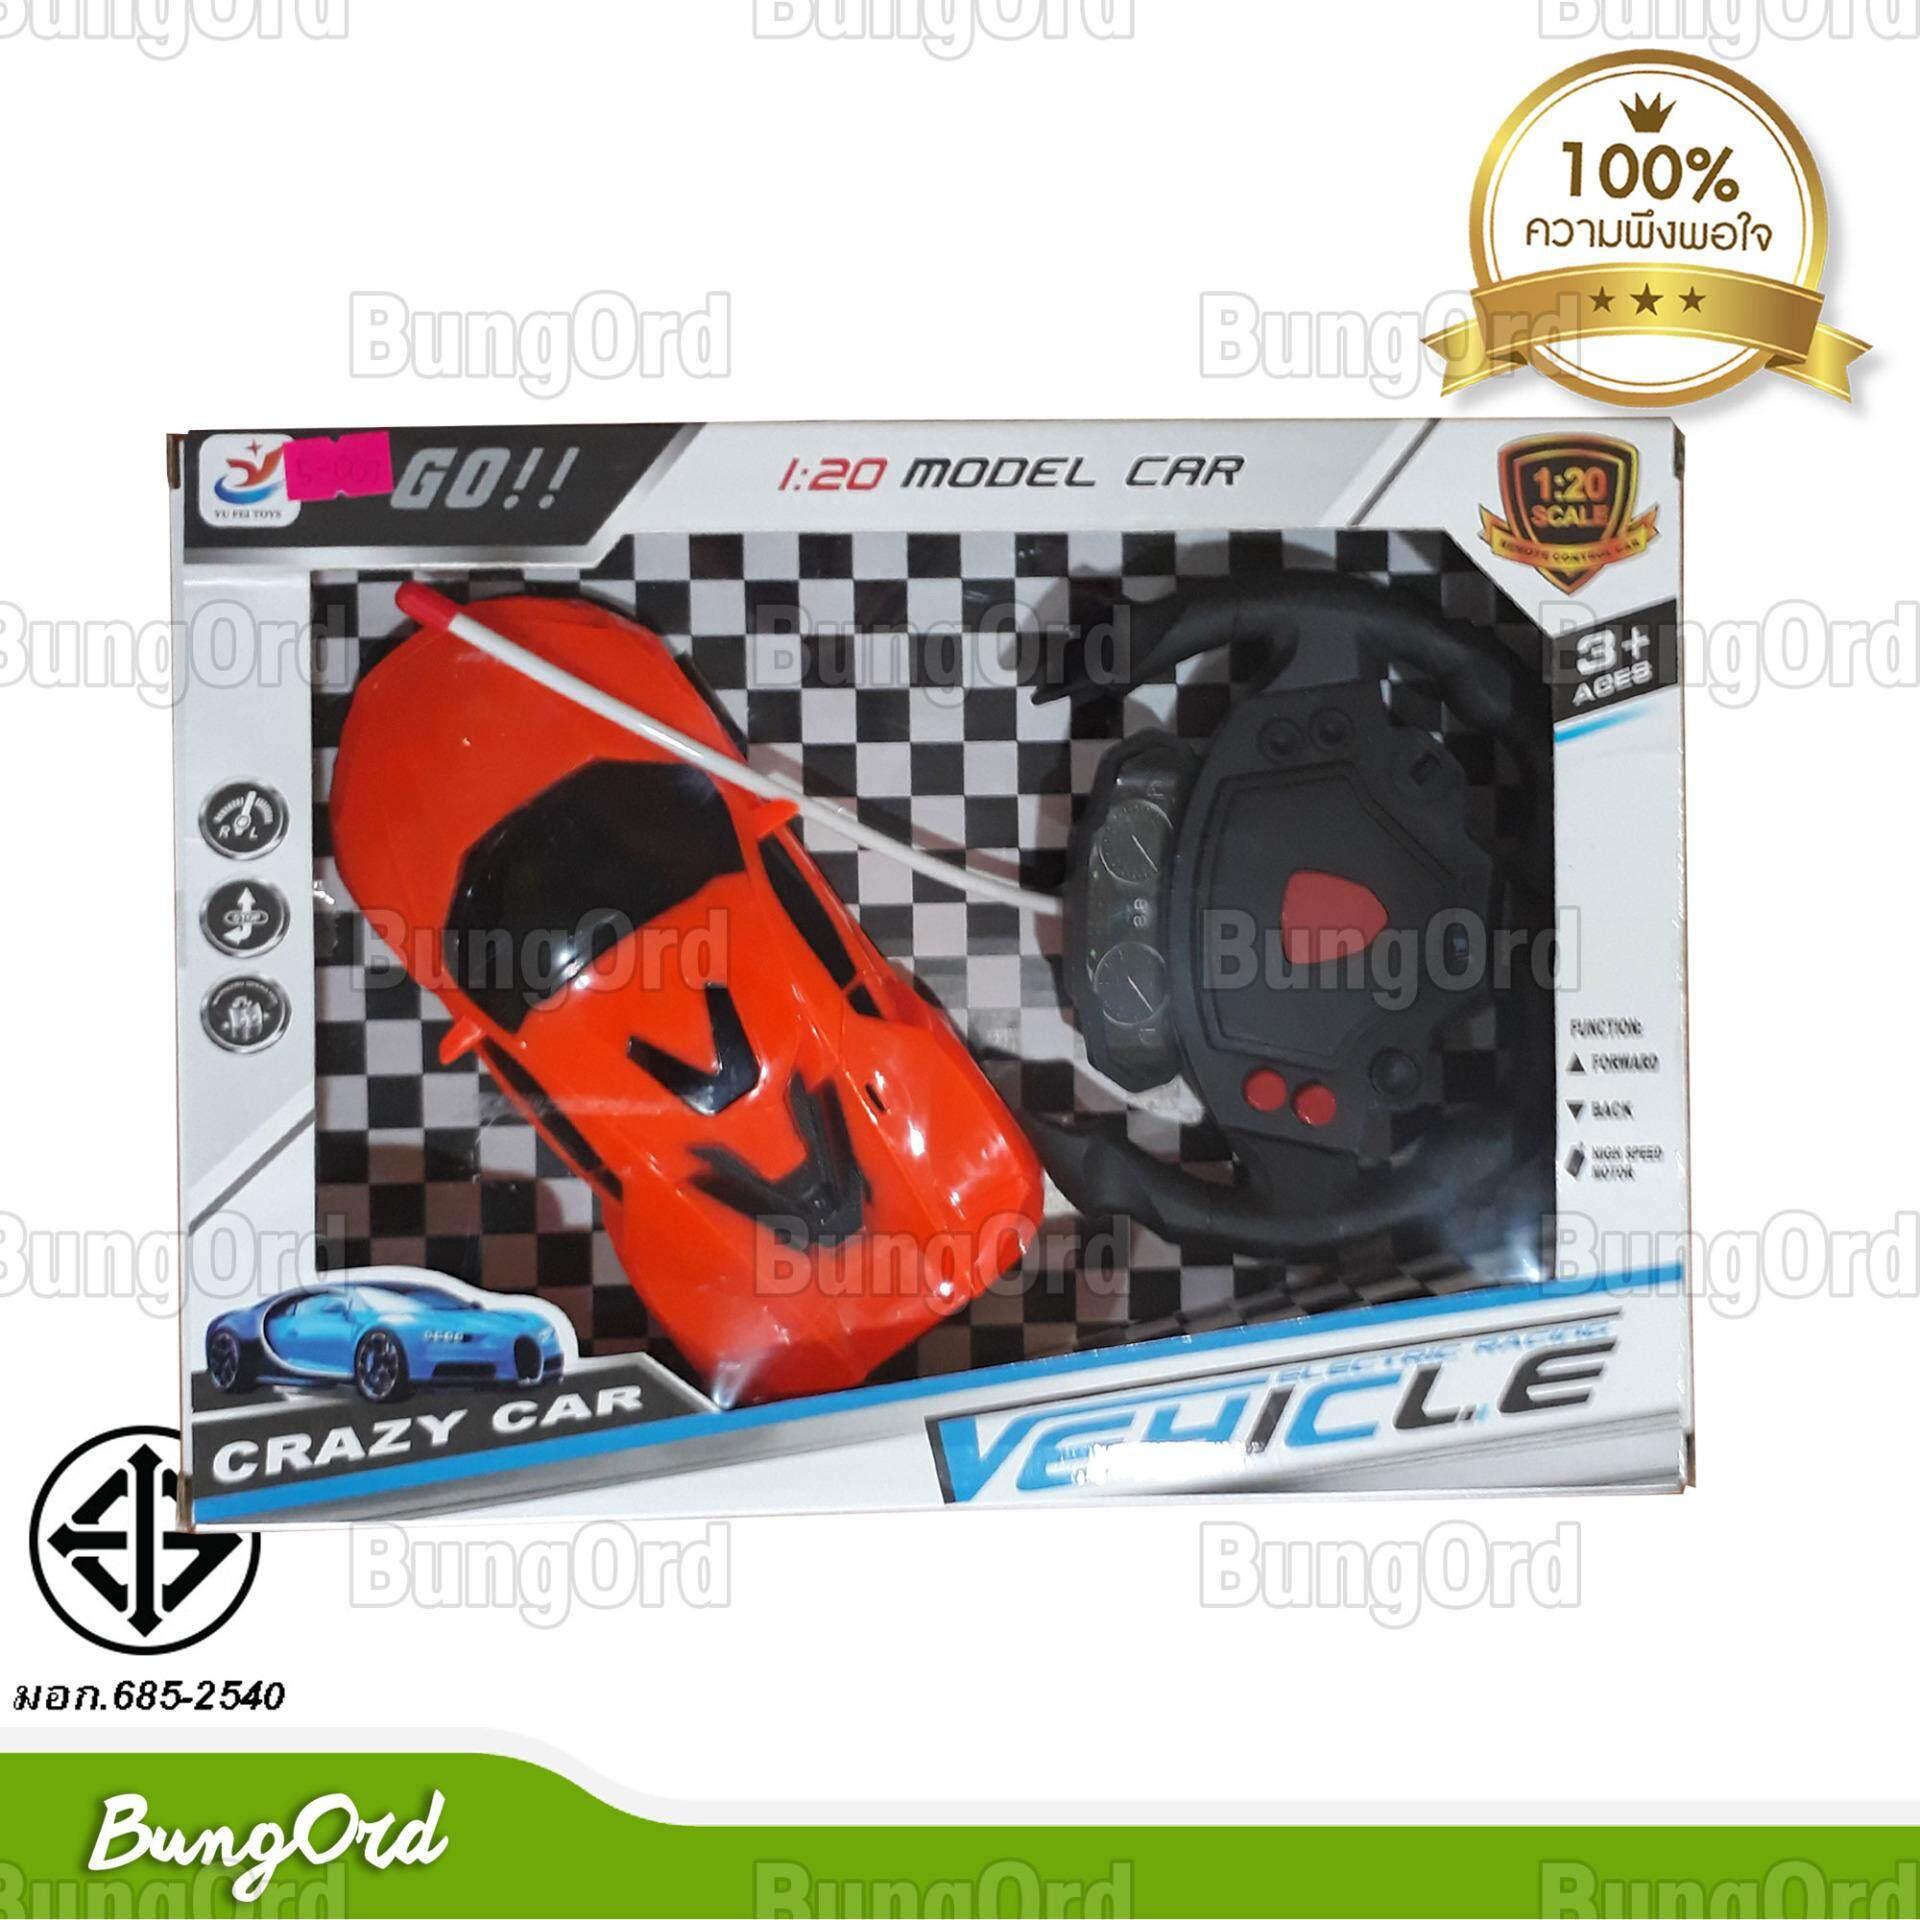 Toys 5007o รถสปอร์ต บังคับ สีส้ม Crazy Car มี รีโมทคอนโทรล วัสดุปลอดภัย มี มอก. ของเล่น Venicle Electric Racing สร้างเสริมจินตนาการ The Best Gifts For Children Funny Toy Knead Your Interesting Childhood Its A Magical World Lets Play Together By Bungord.